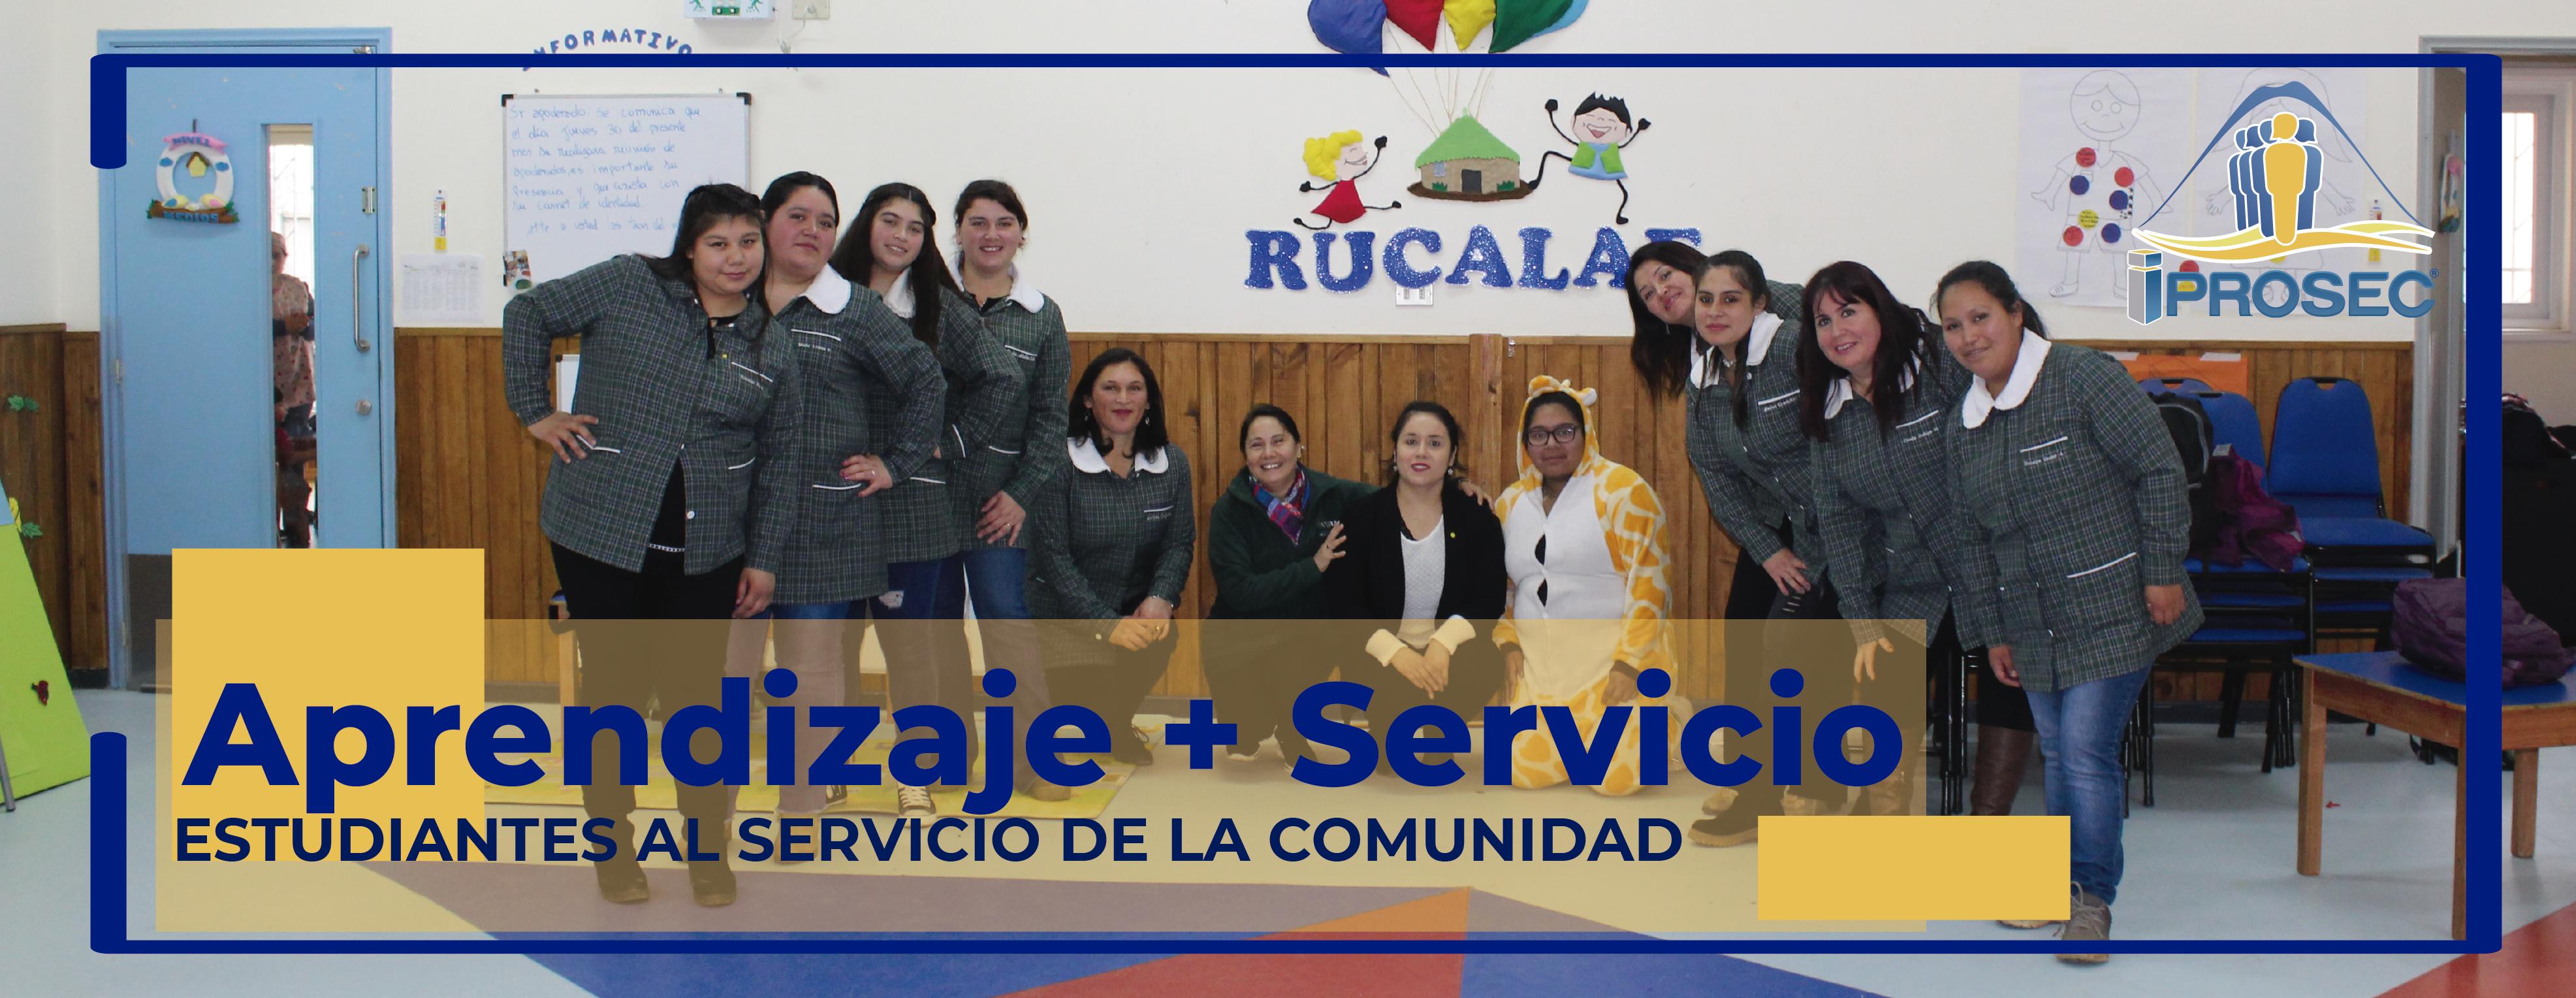 Aprendizaje+Servicio